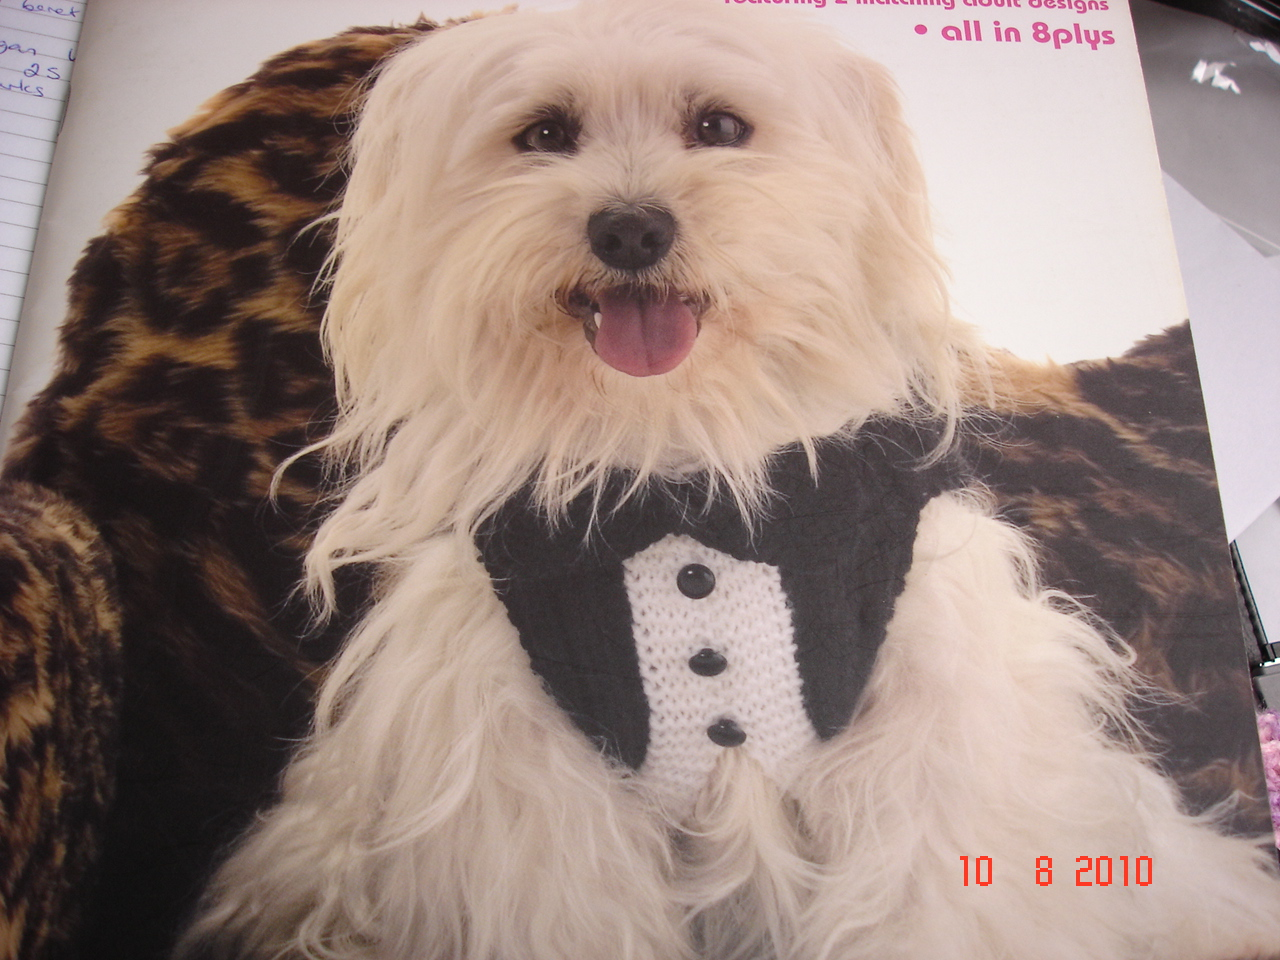 Knitting Pattern For Dogs Tuxedo : Tuxedo-style hand knitted dog jacket Felt